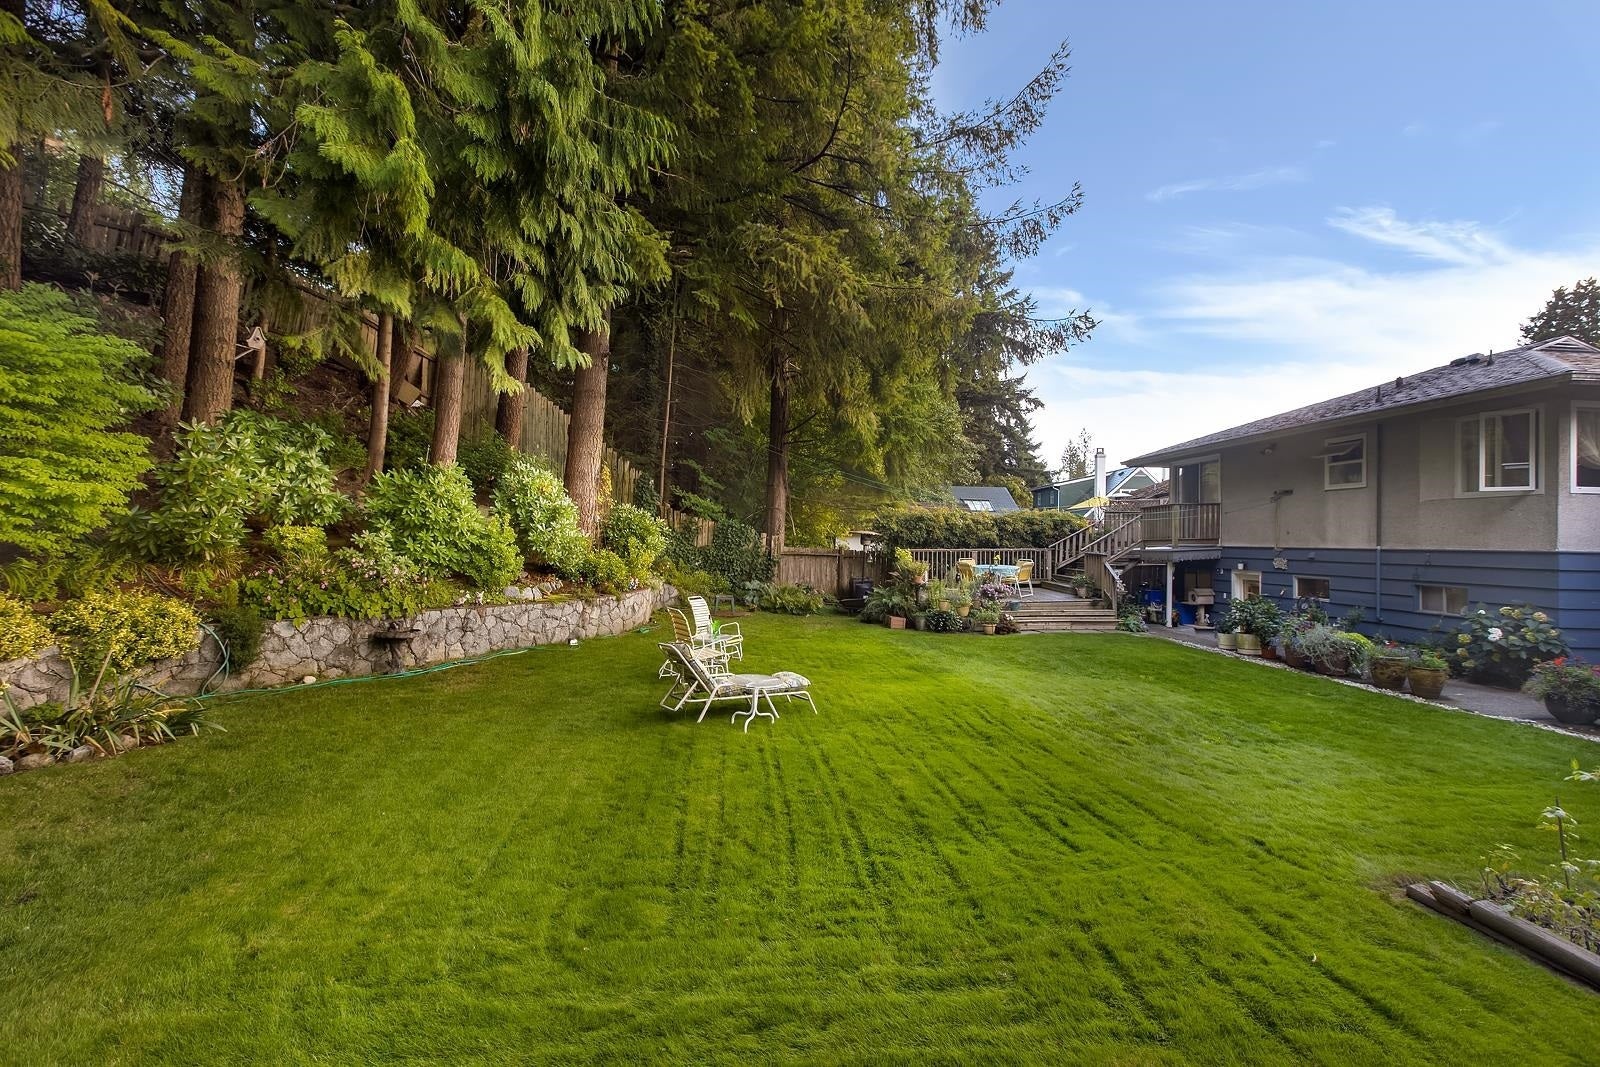 3495 WELLINGTON CRESCENT - Edgemont House/Single Family for sale, 3 Bedrooms (R2617949) - #5